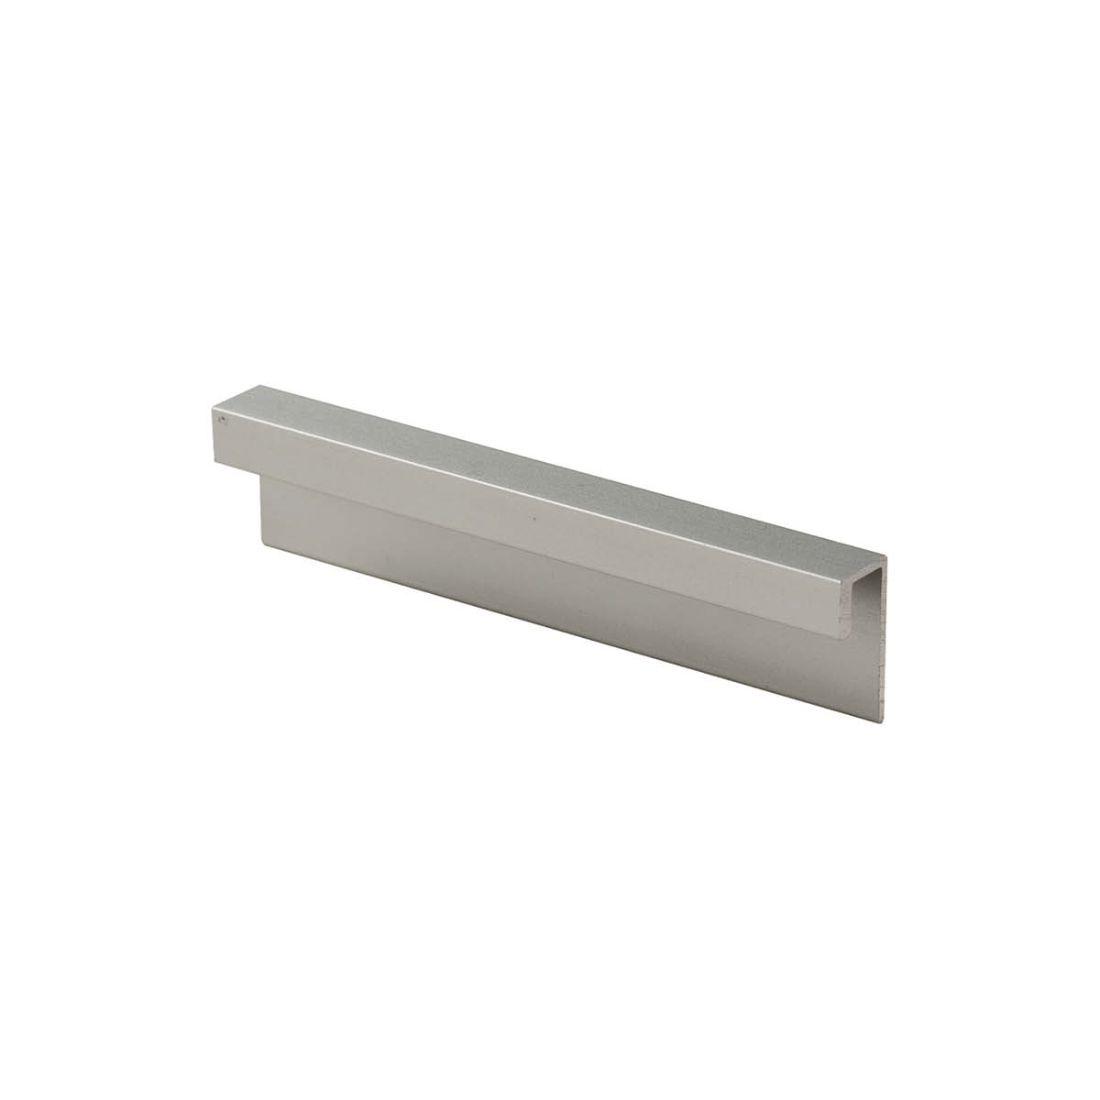 Aluminium End Cap Stealth 2700 x 4.5mm